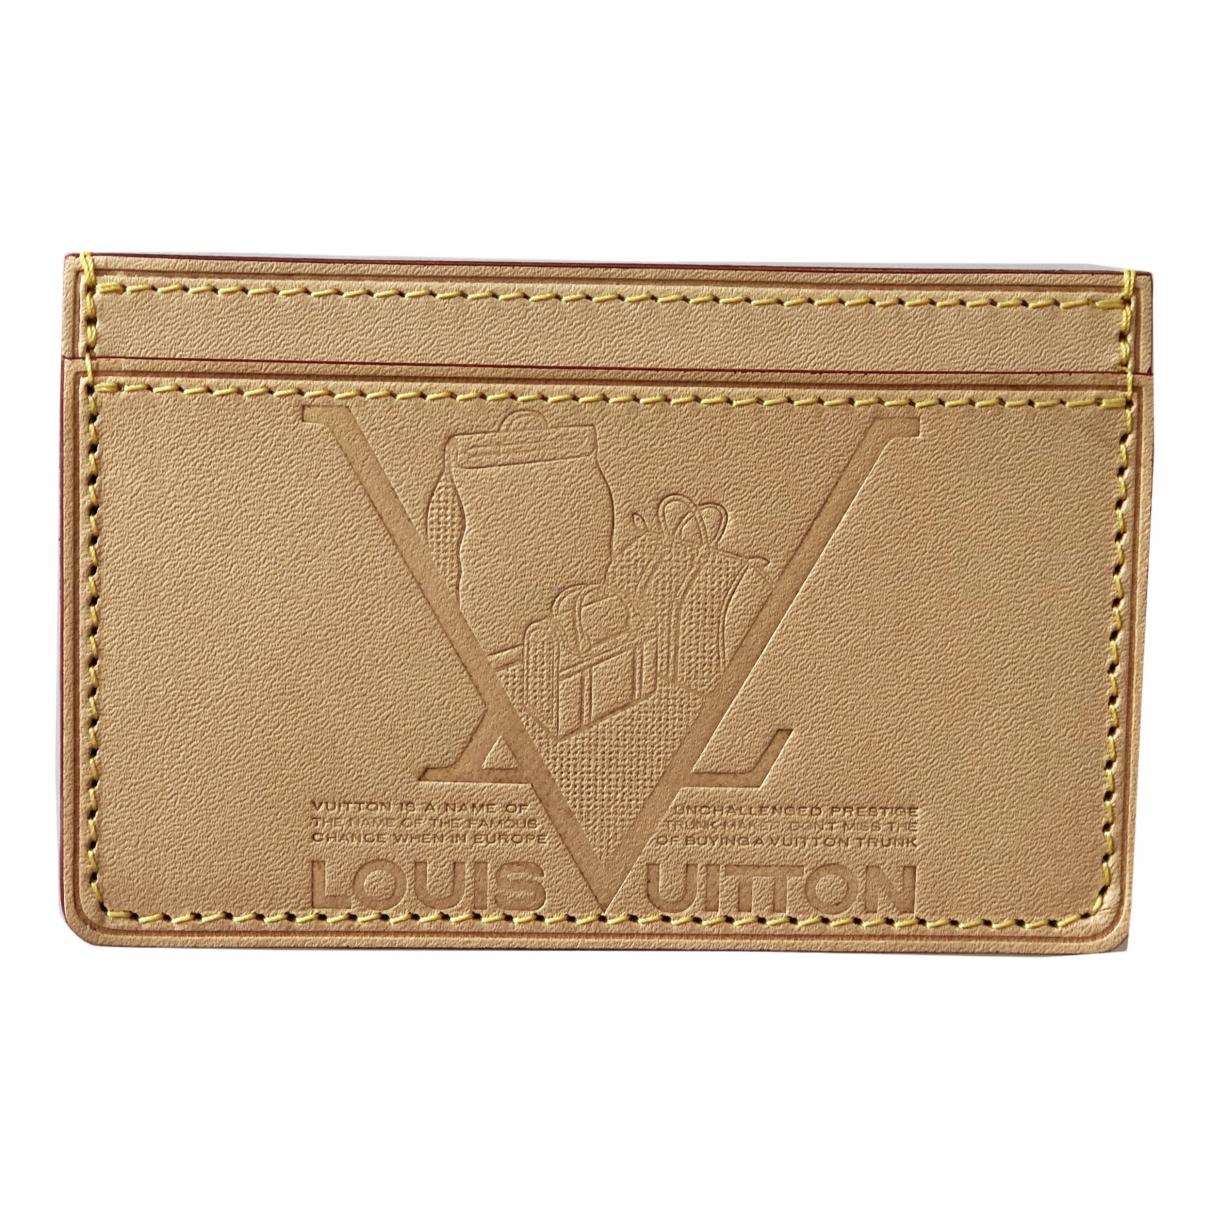 Louis Vuitton \N Beige Leather Purses, wallet & cases for Women \N